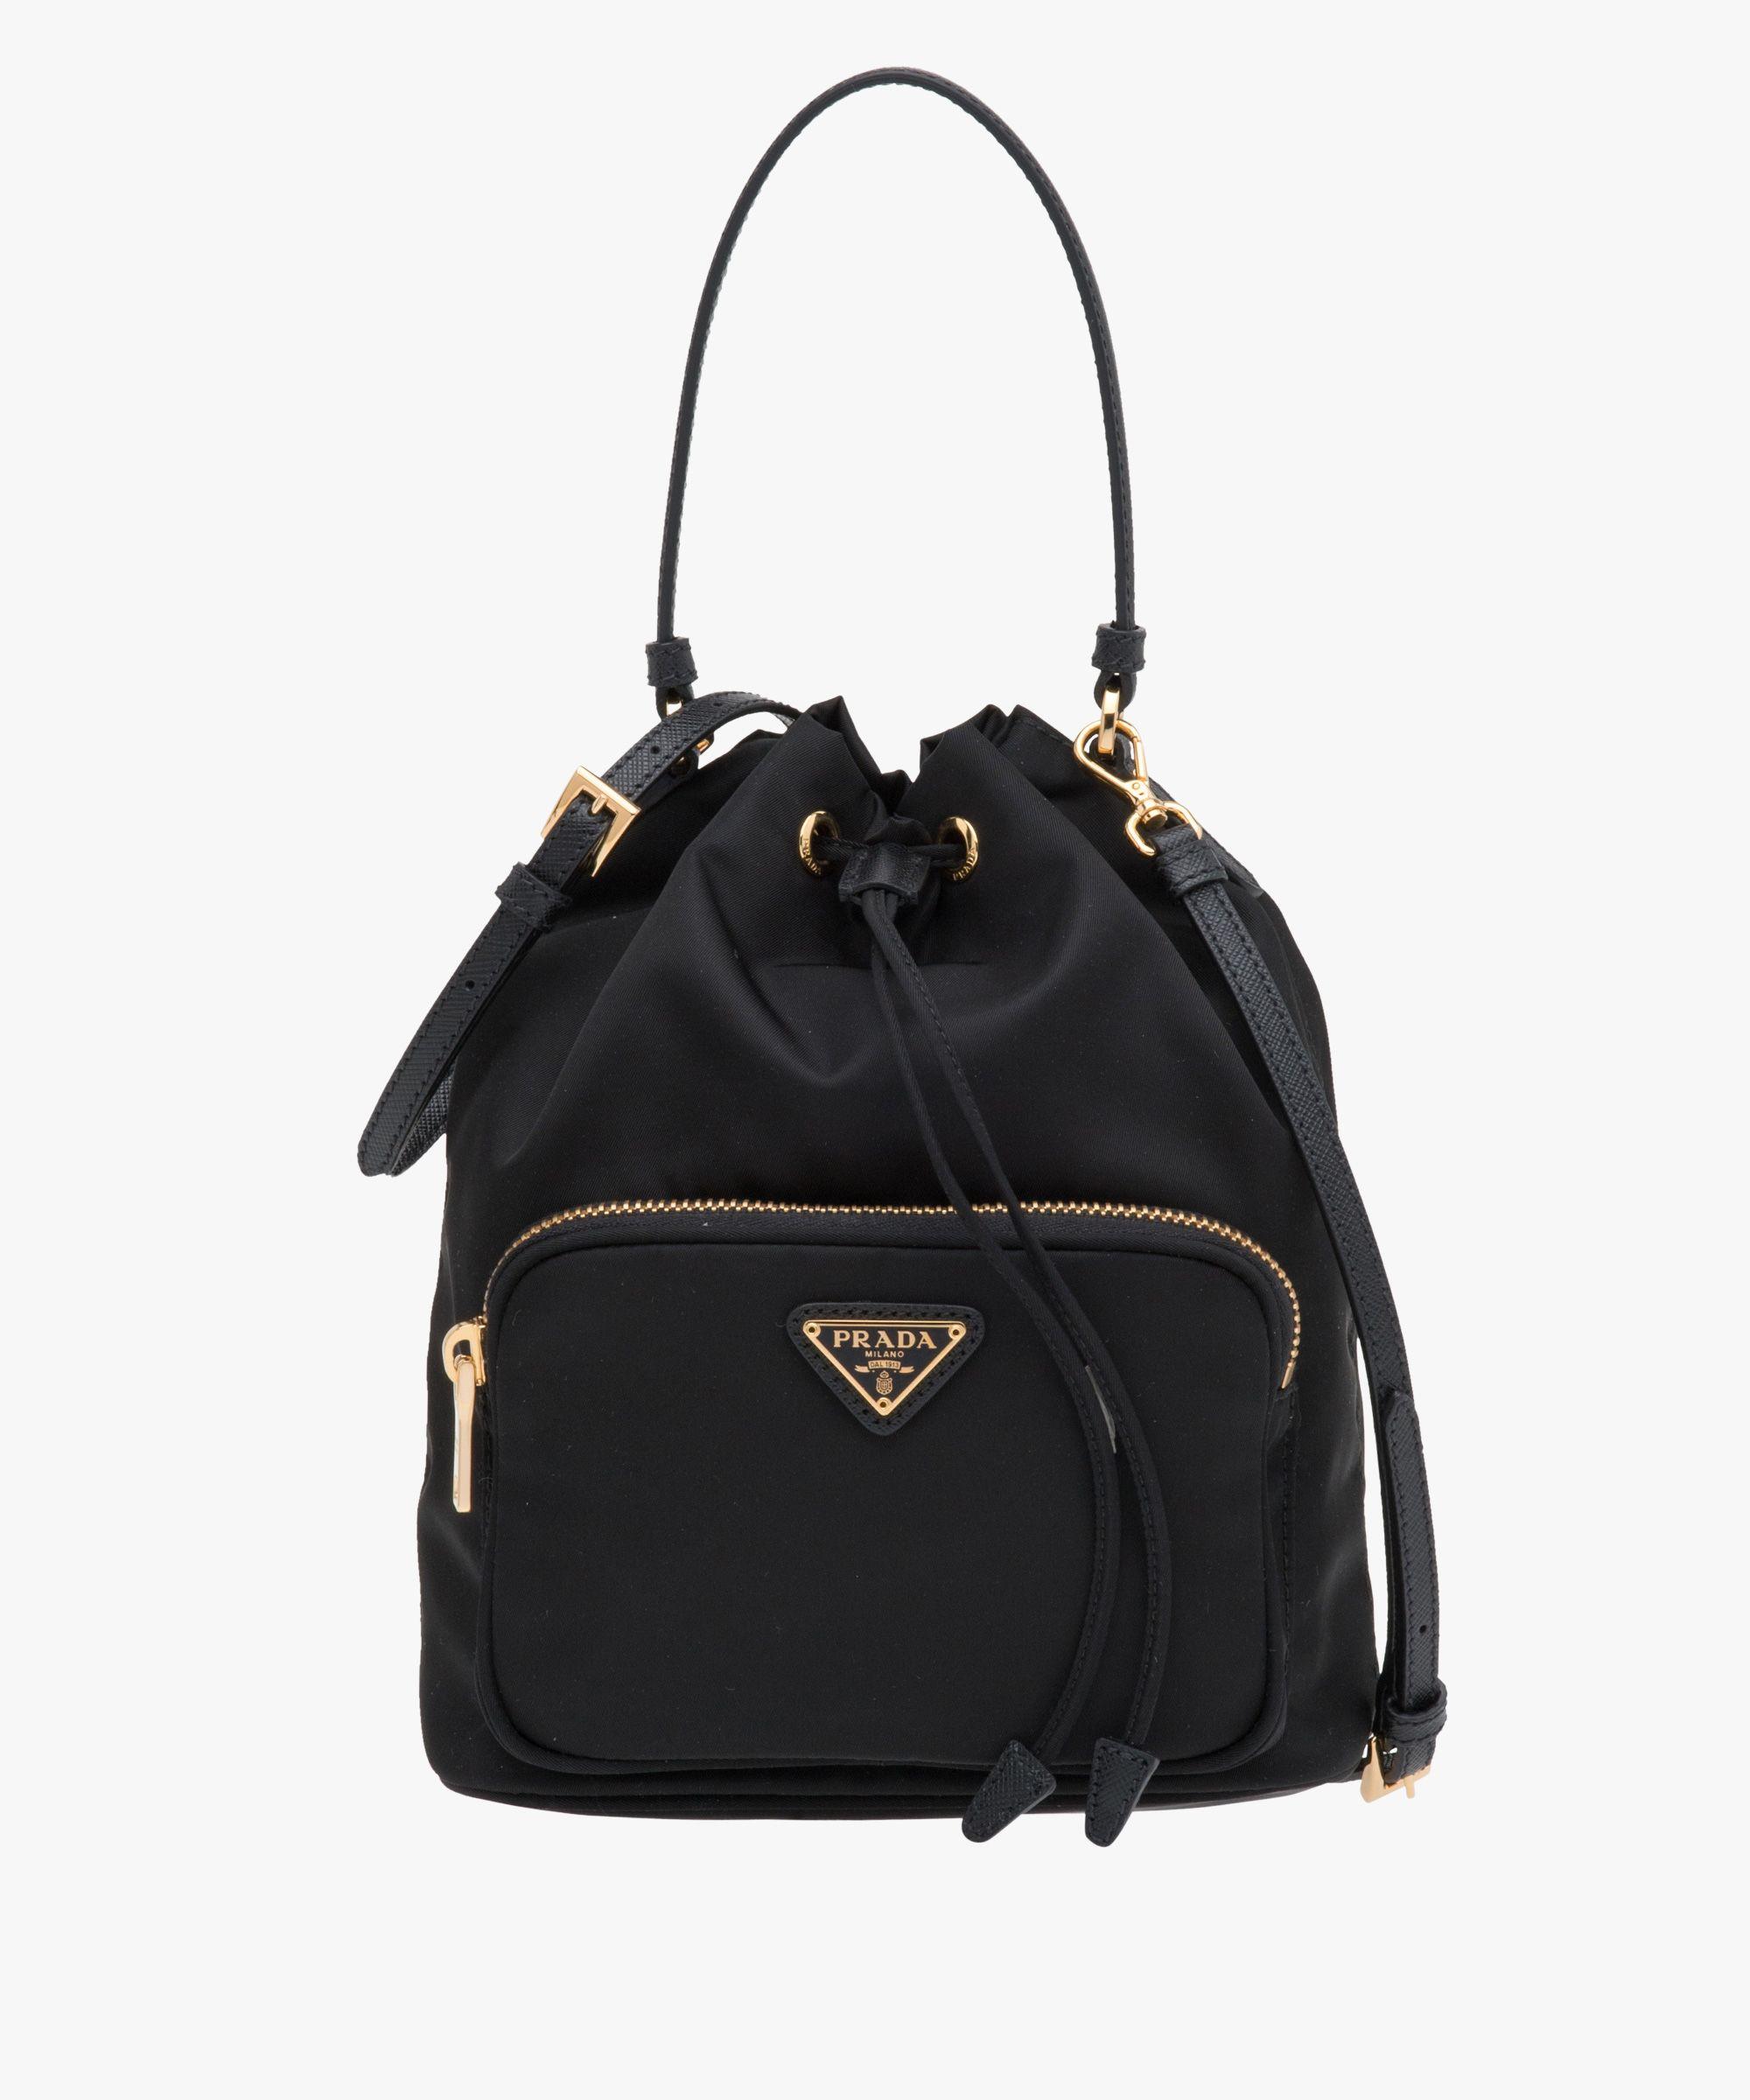 33a10e823c2317 Prada Woman - Fabric mini bag - Black - 1BH038_074_F0002_V_OOO